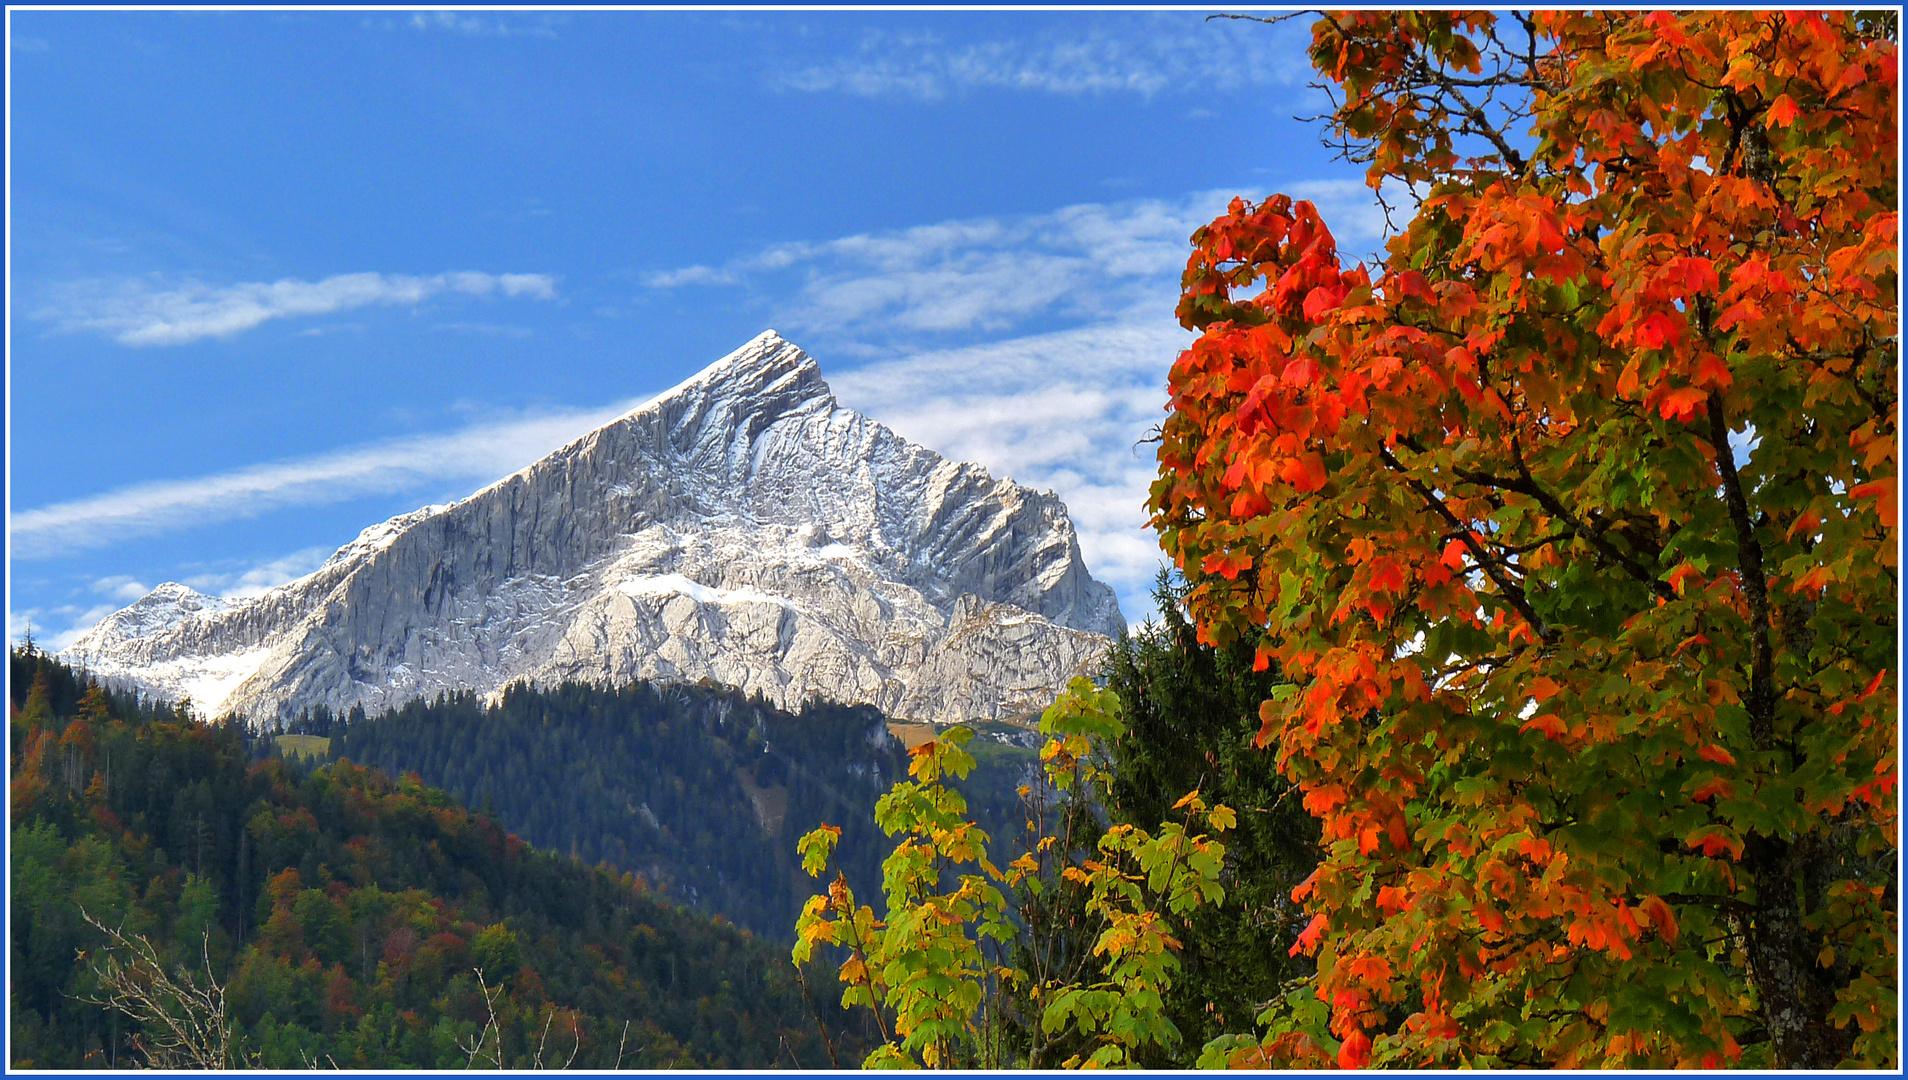 Herbst in Garmisch, Oktober 2010-Alpspitze